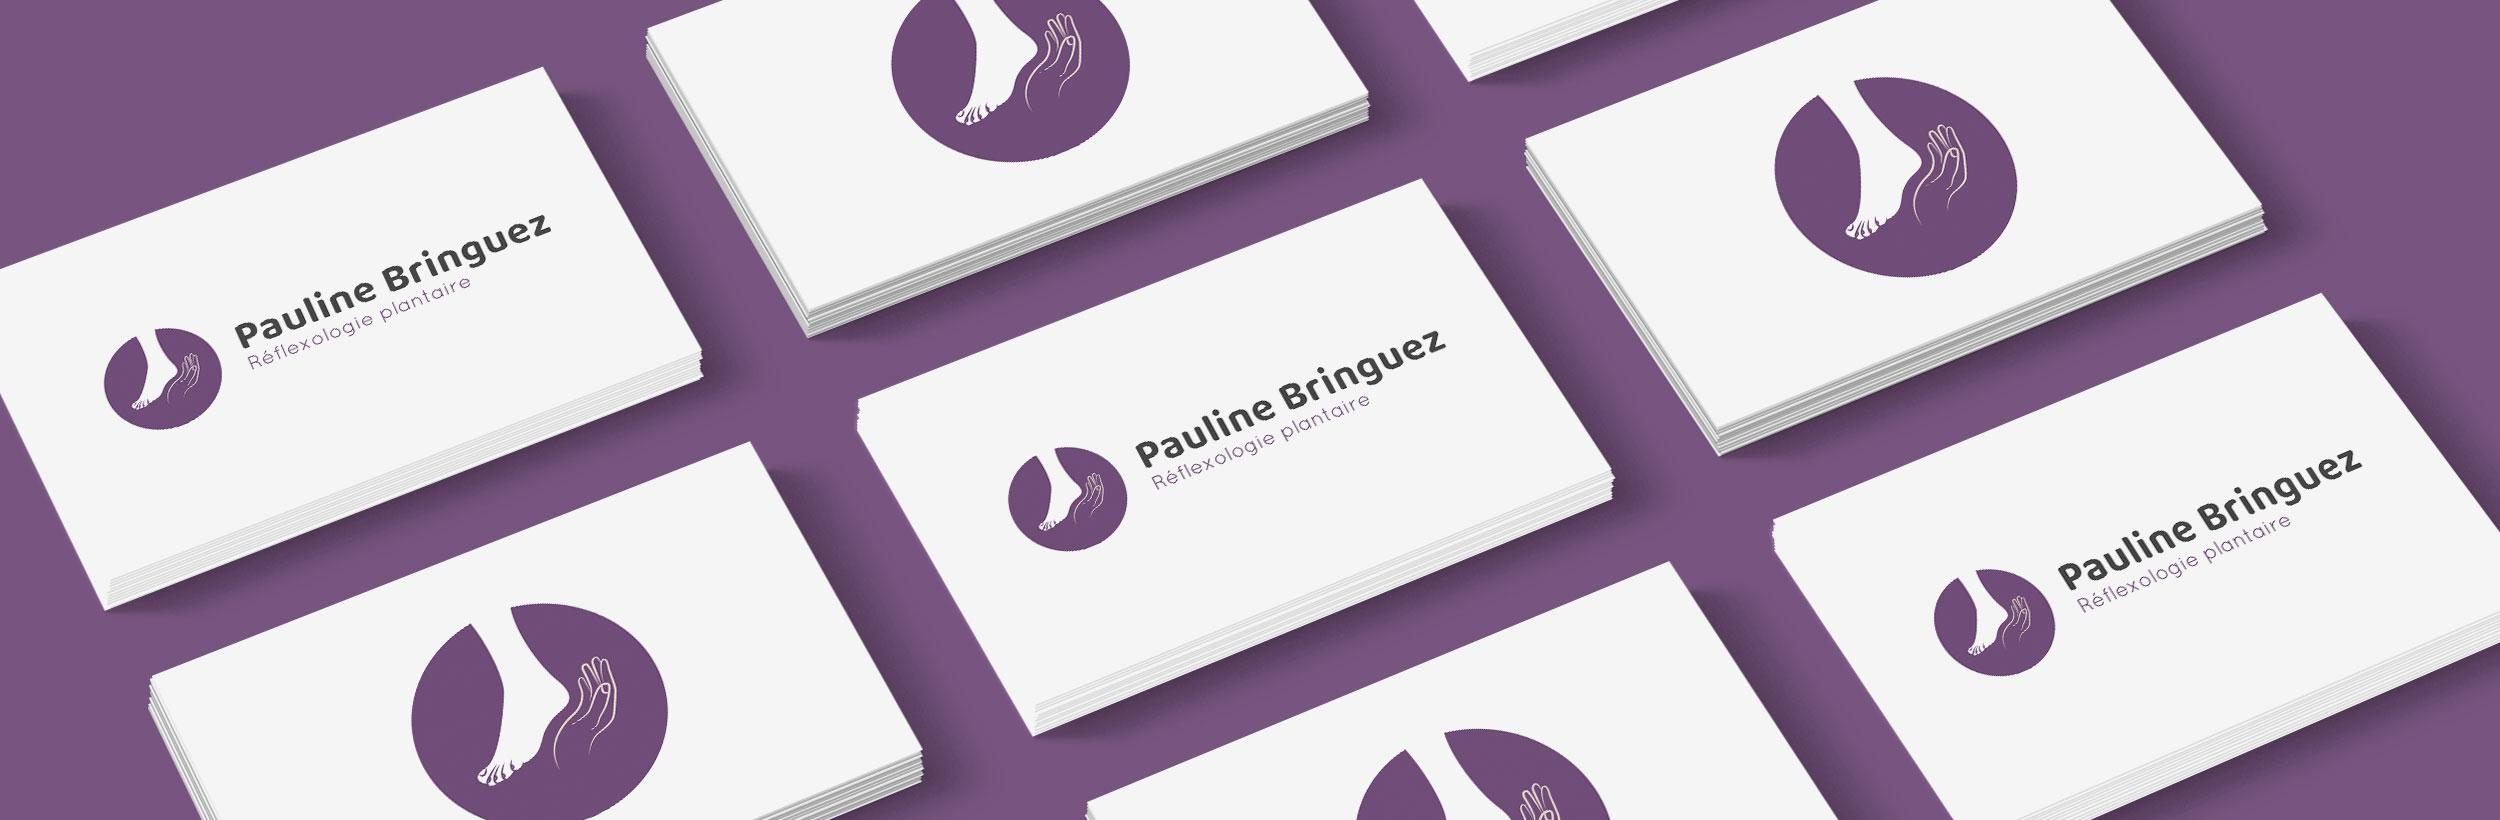 professionnels-print-identite-visuelle-pbreflexo-pagetop